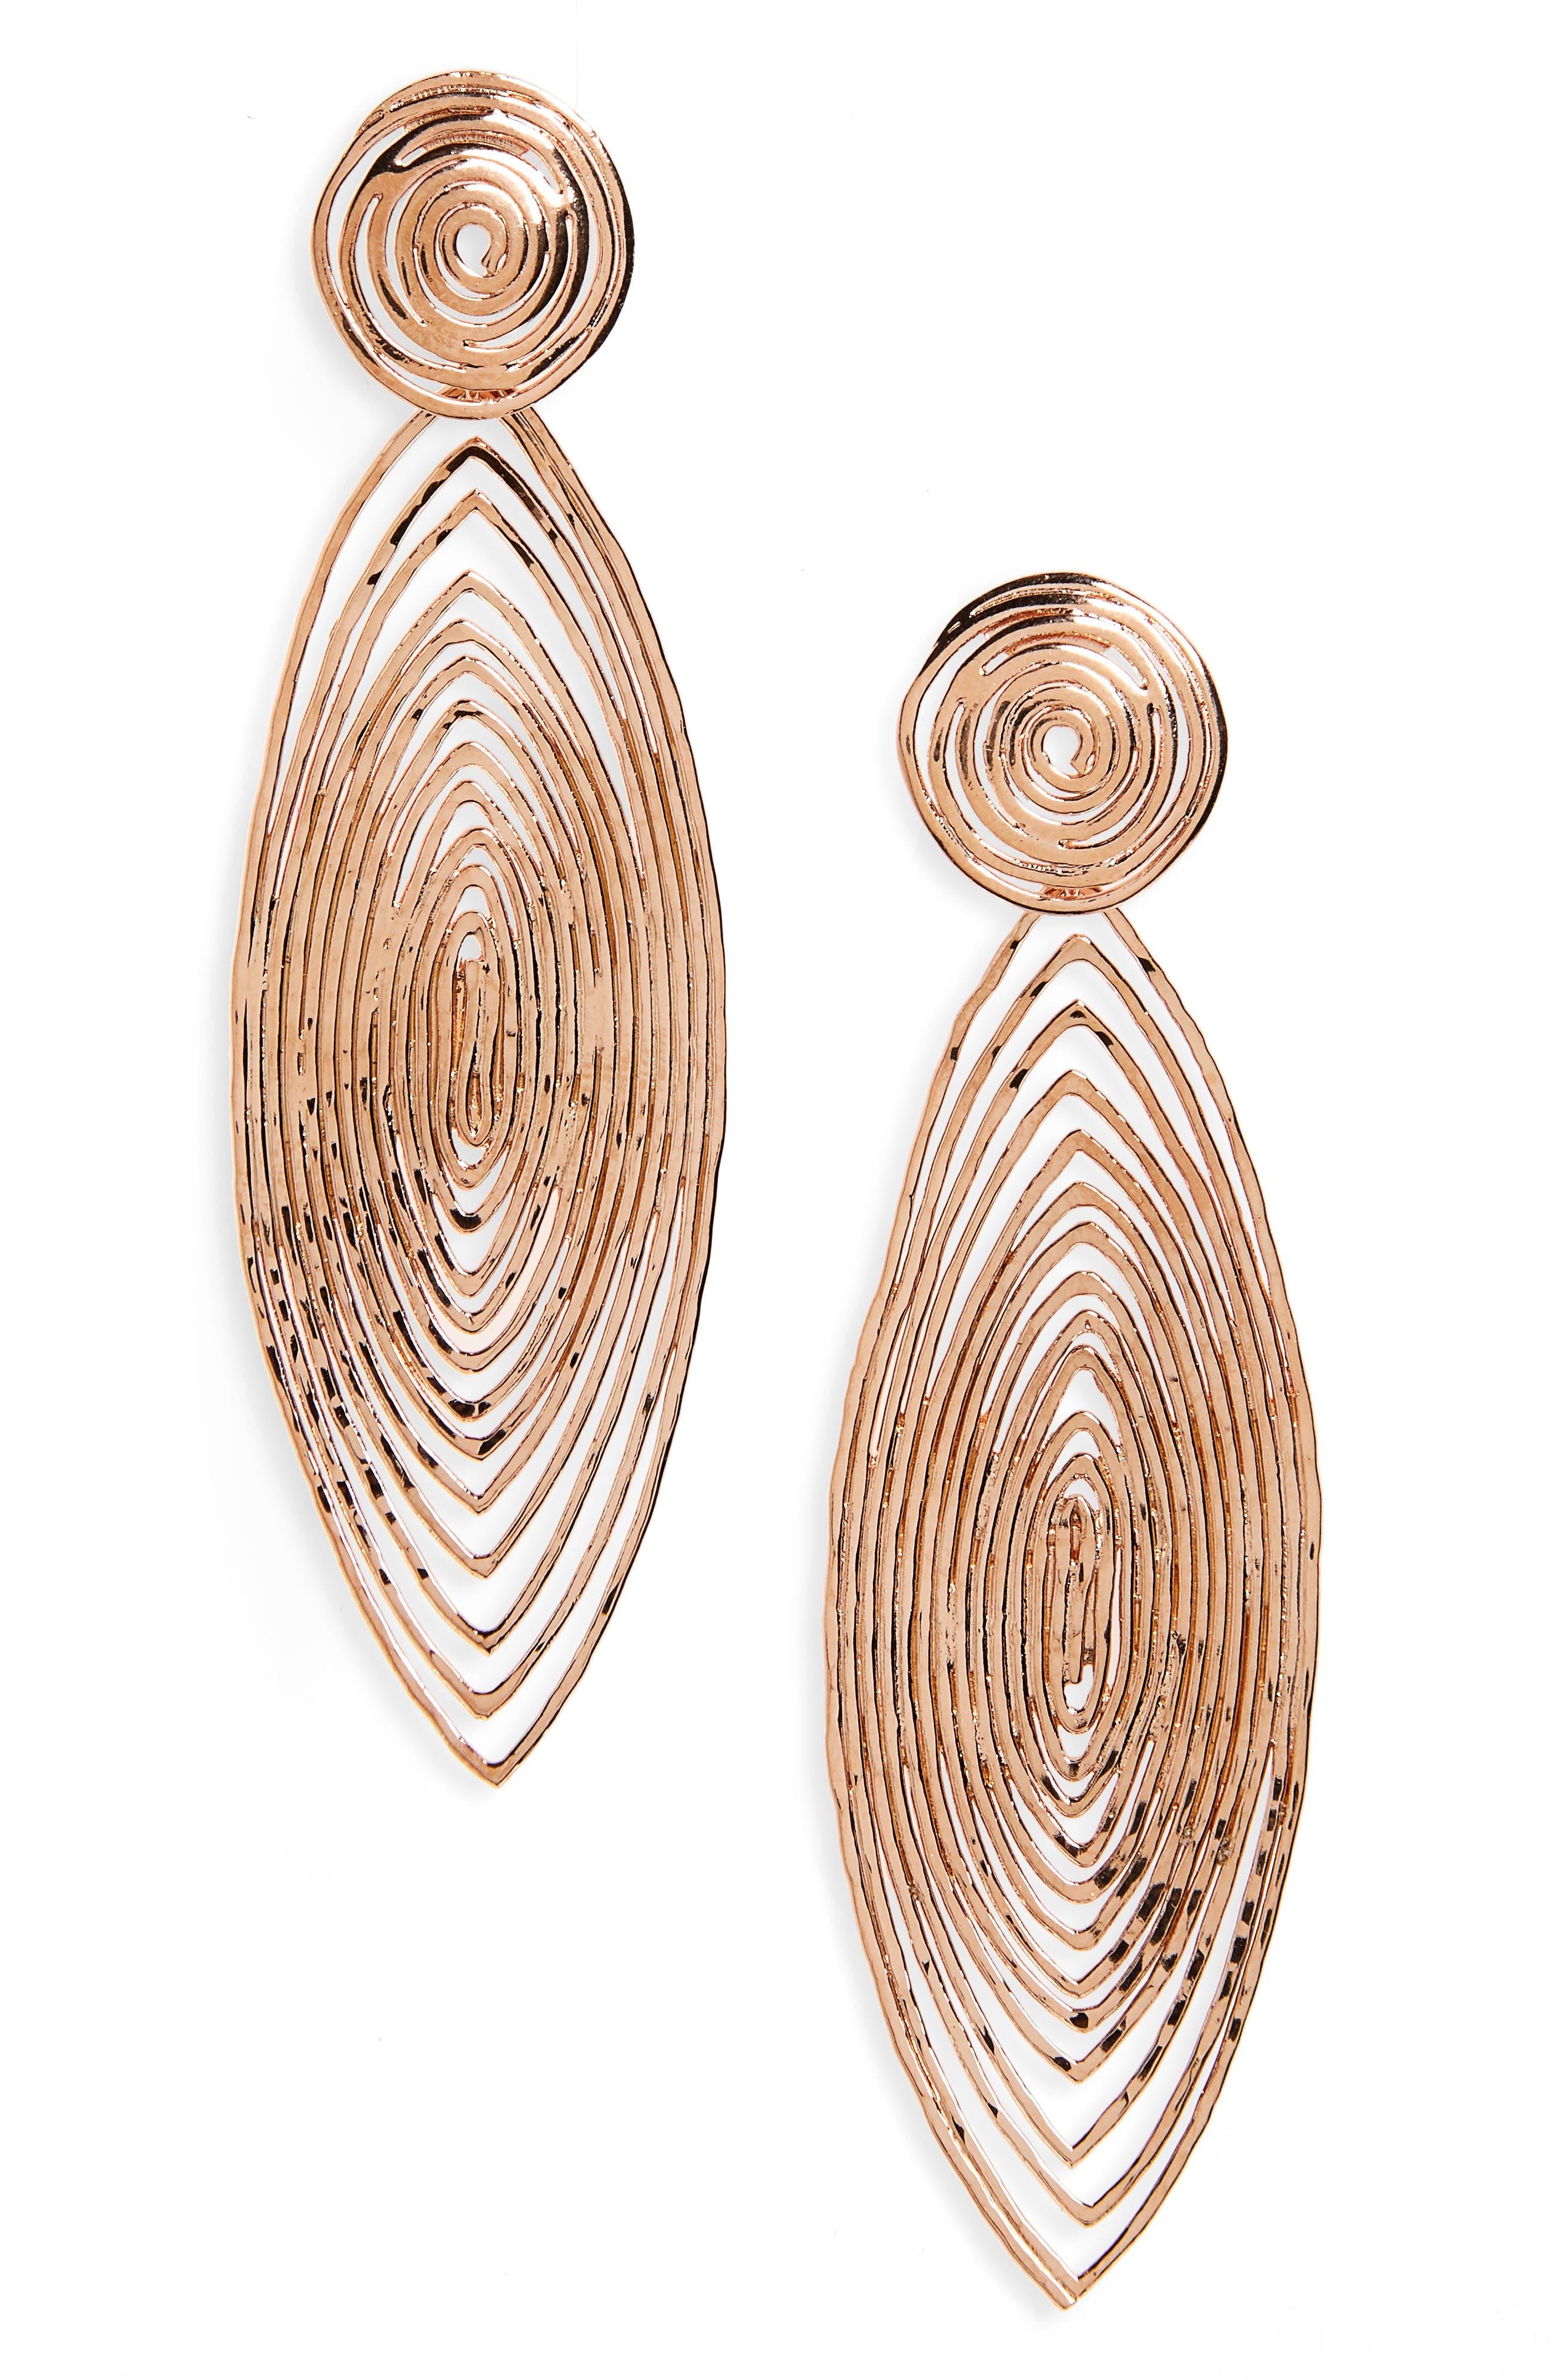 Alternate Image 1 Selected - Gas Bijoux 'Long Wave' Drop Earrings